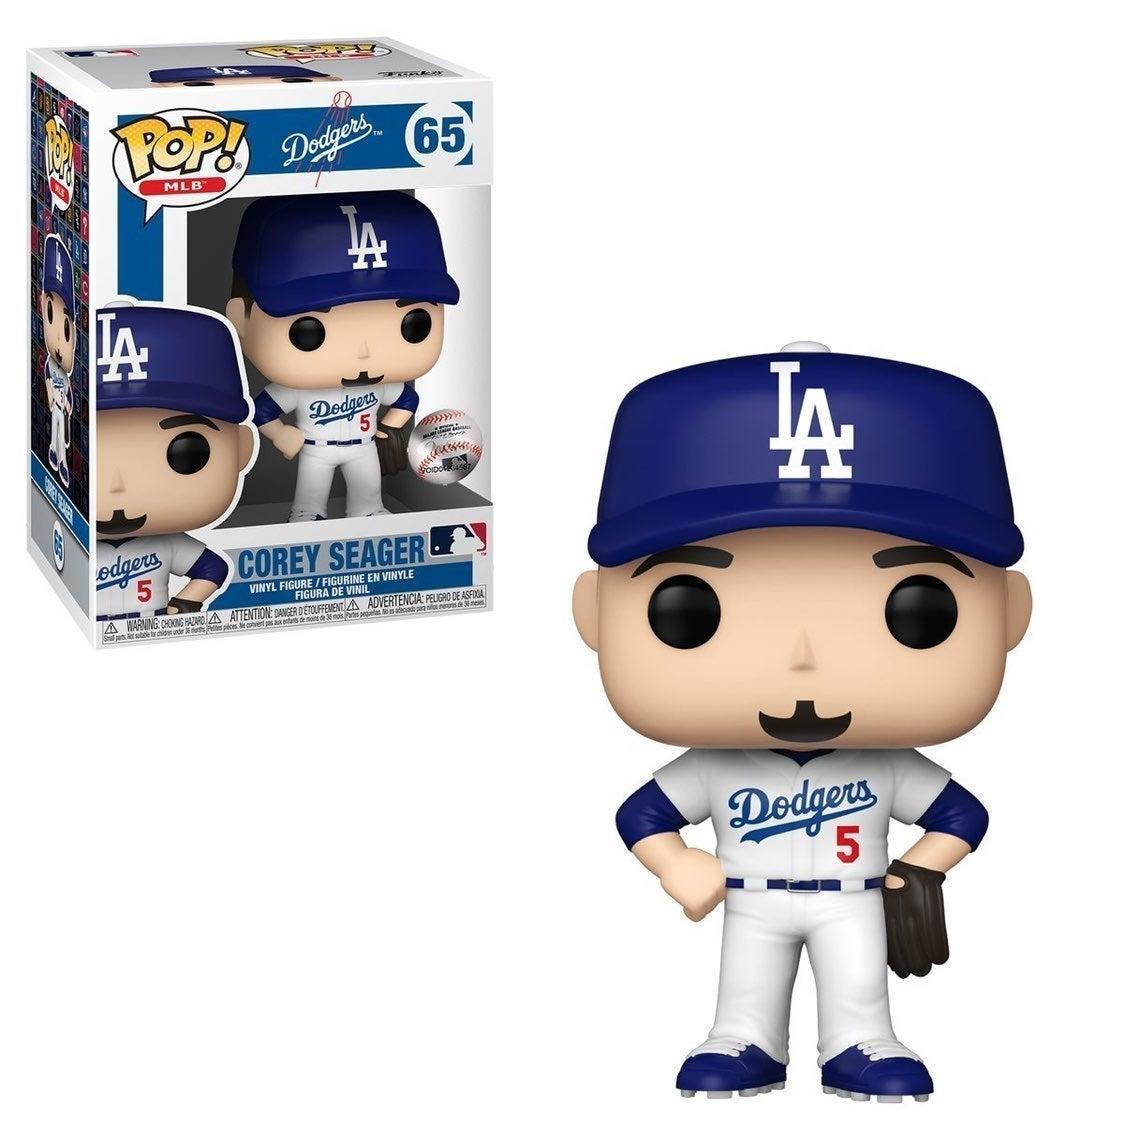 MLB Dodgers Corey Seager Funko Pop!